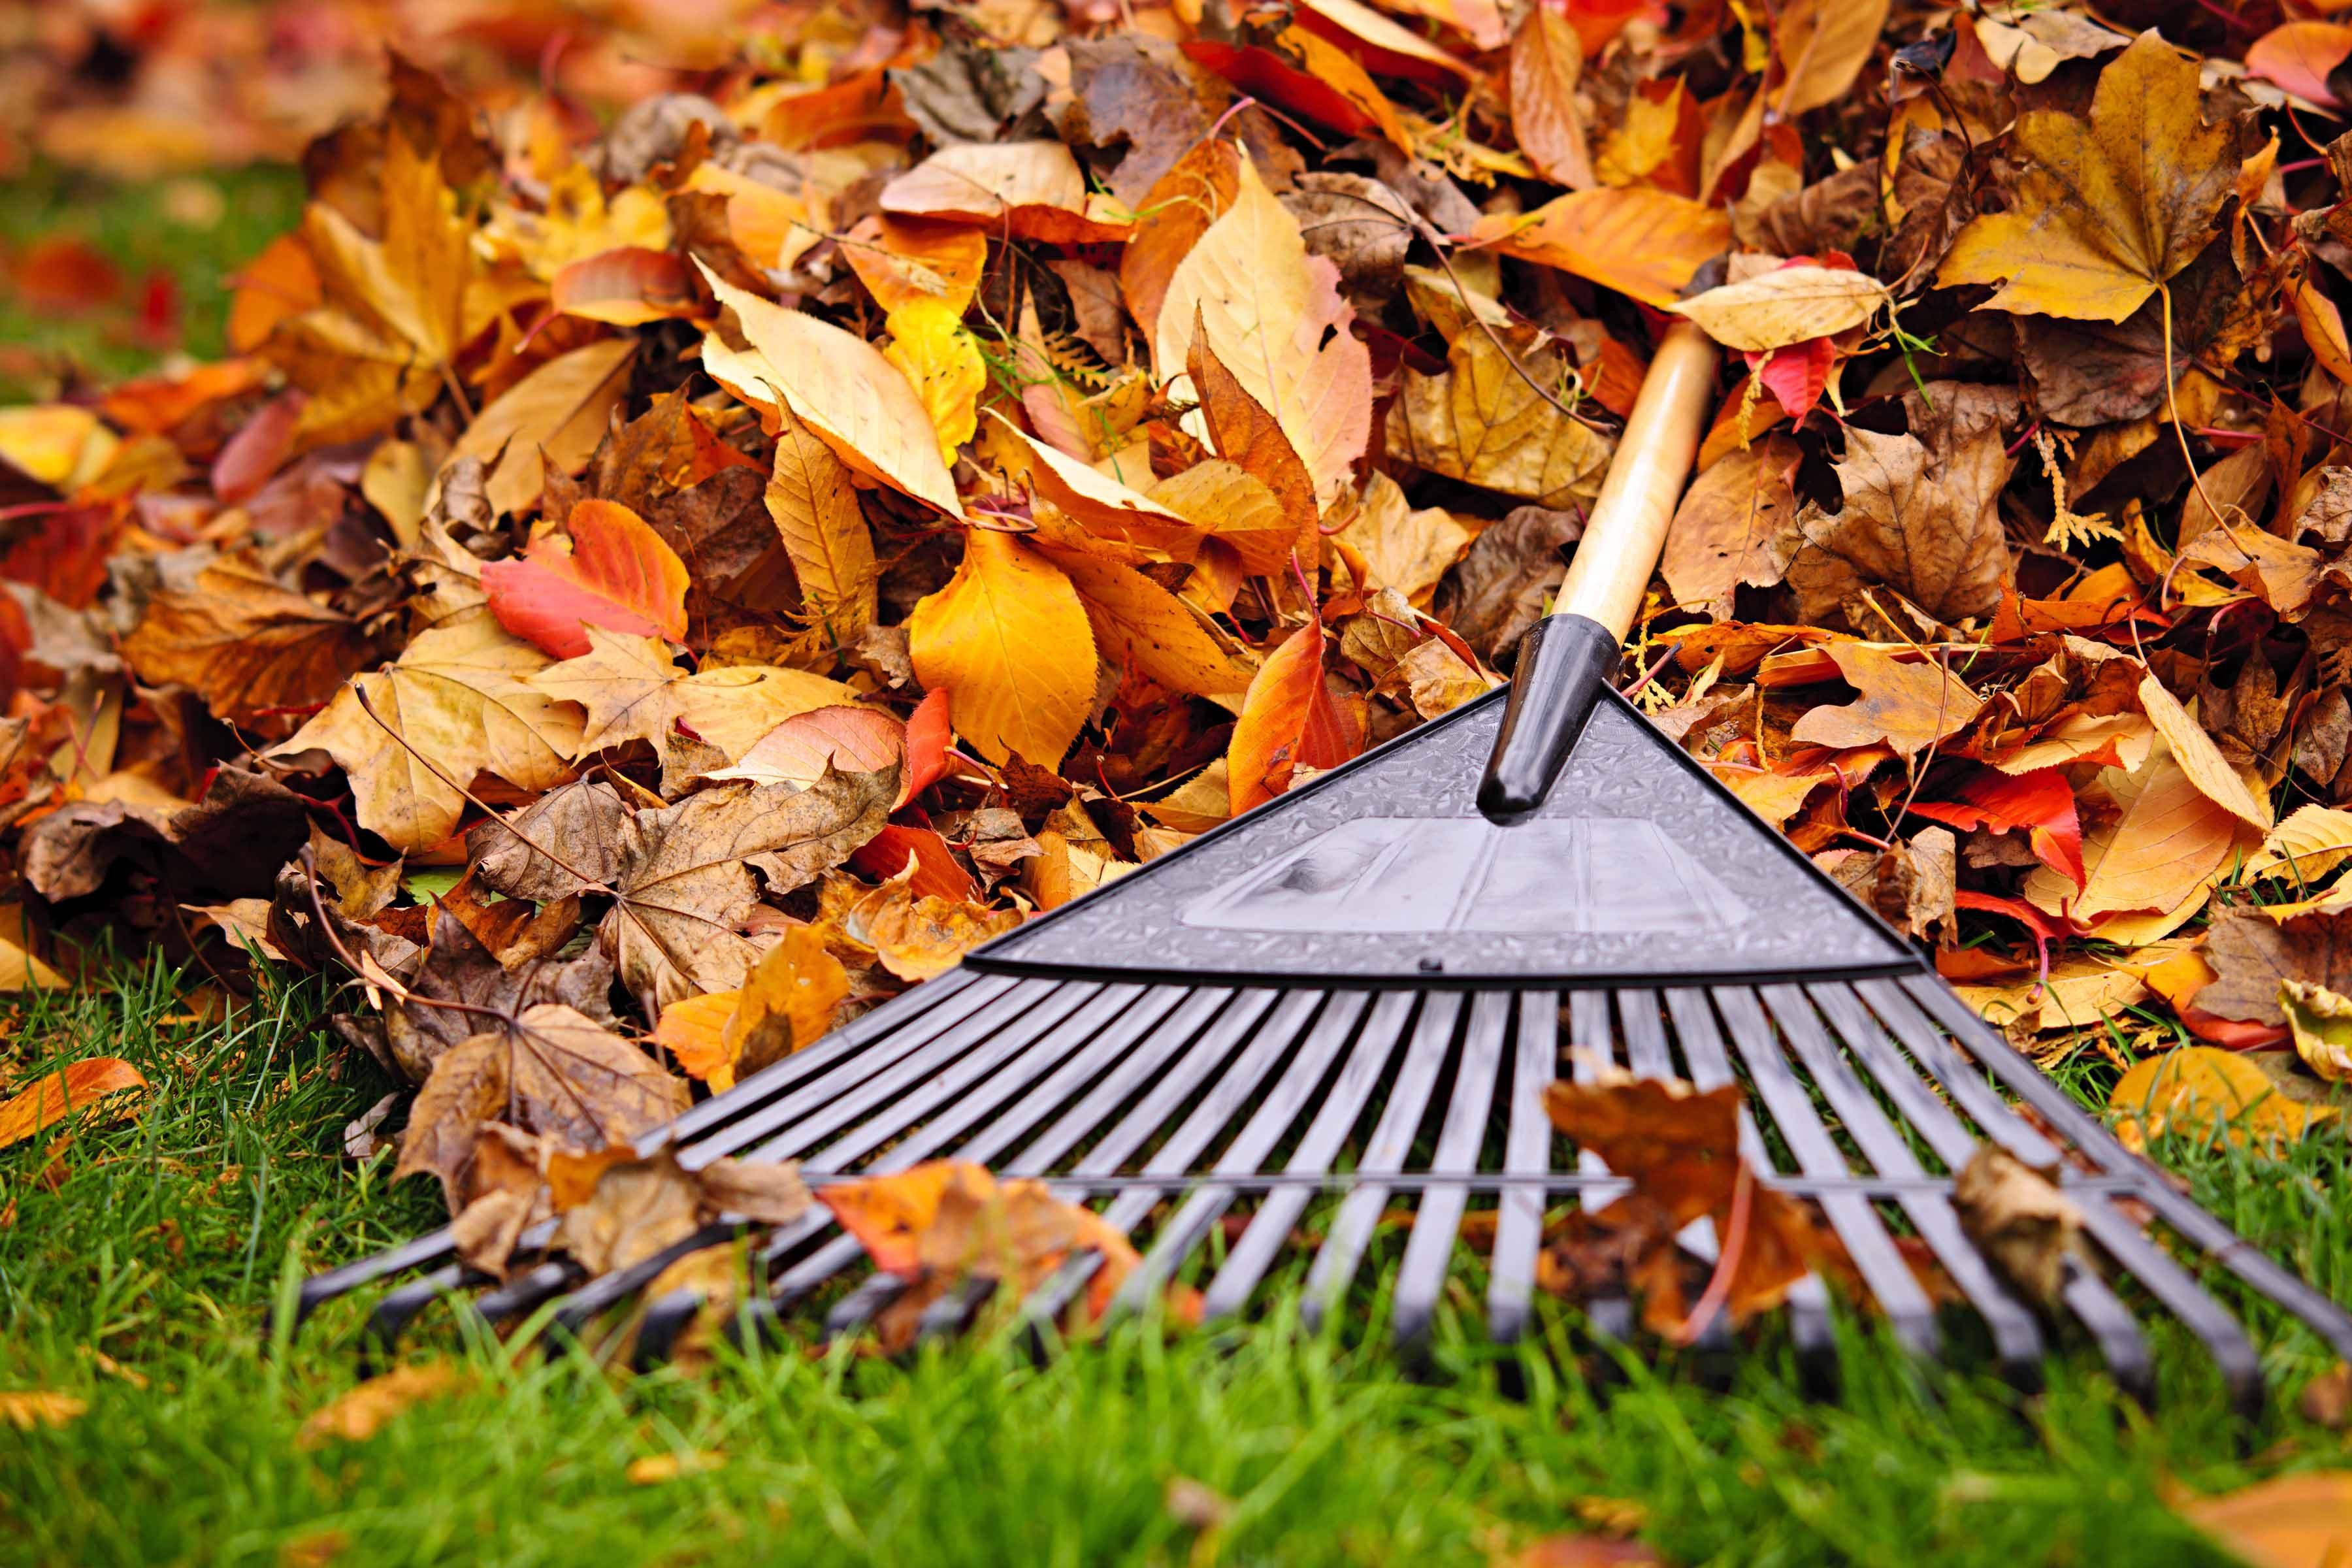 autumn-chores-improve-lawn